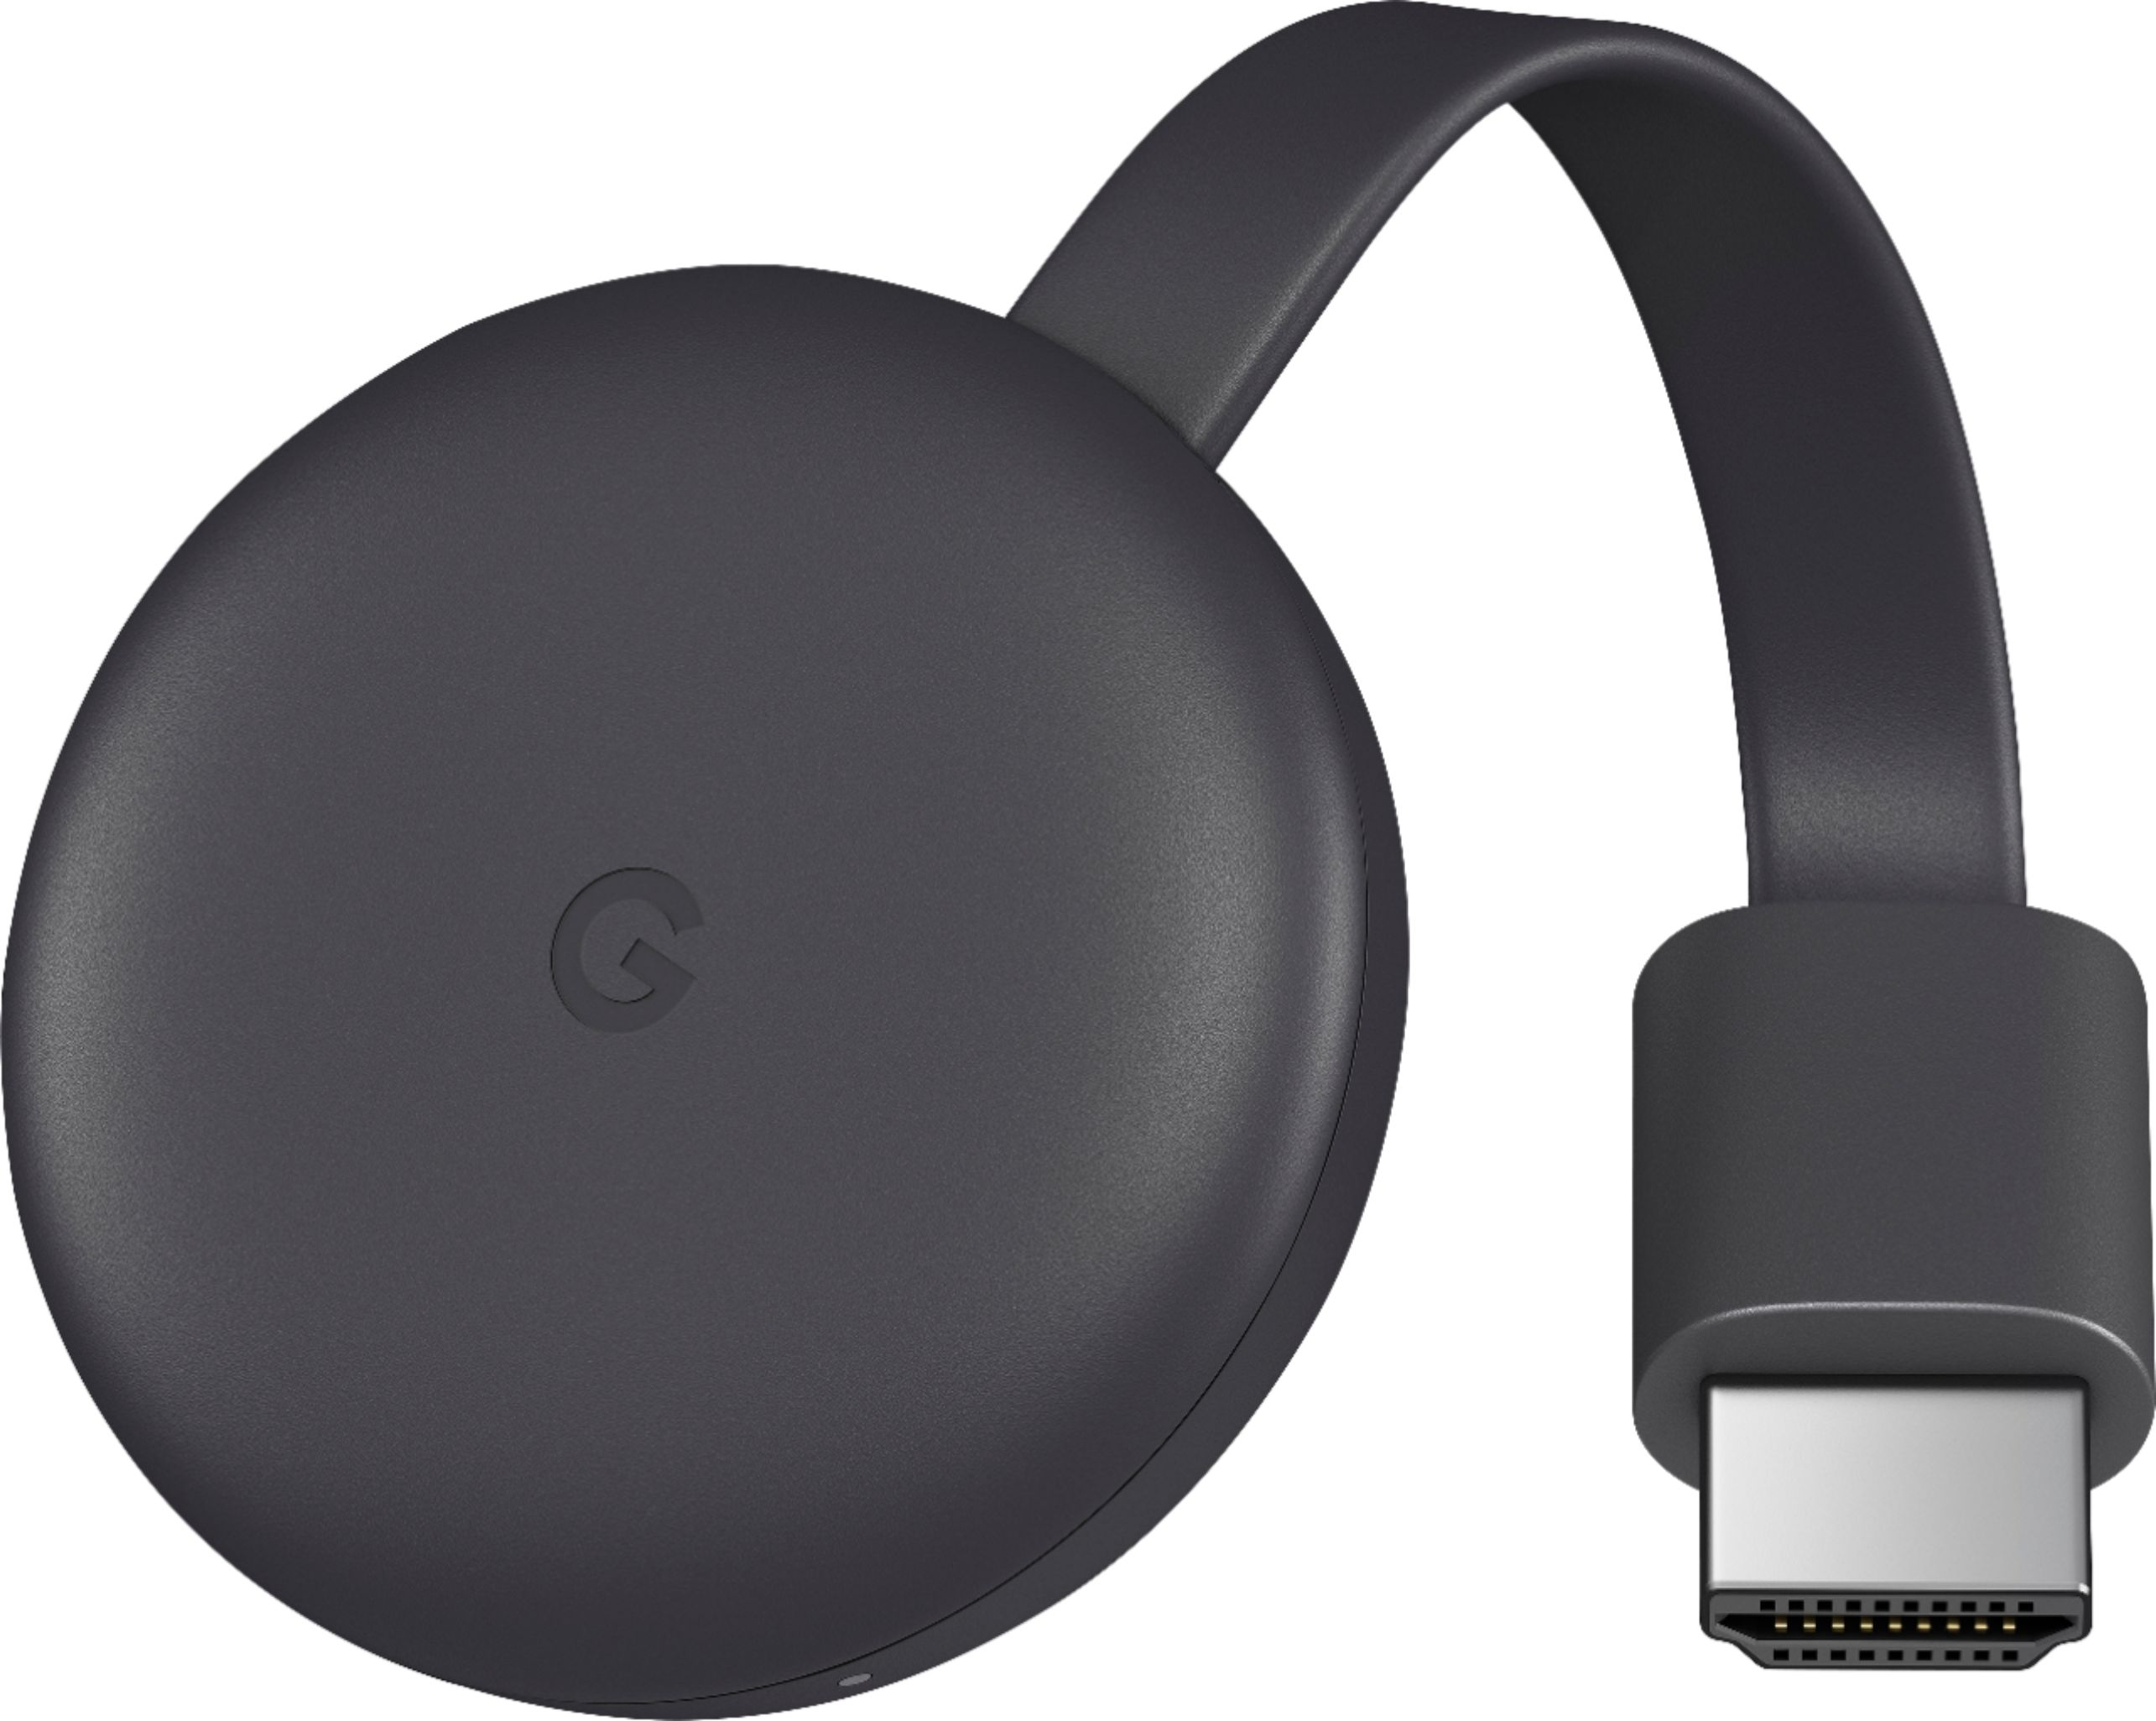 Google Chromecast Streaming Media Player (3rd Generation; Charcoal)